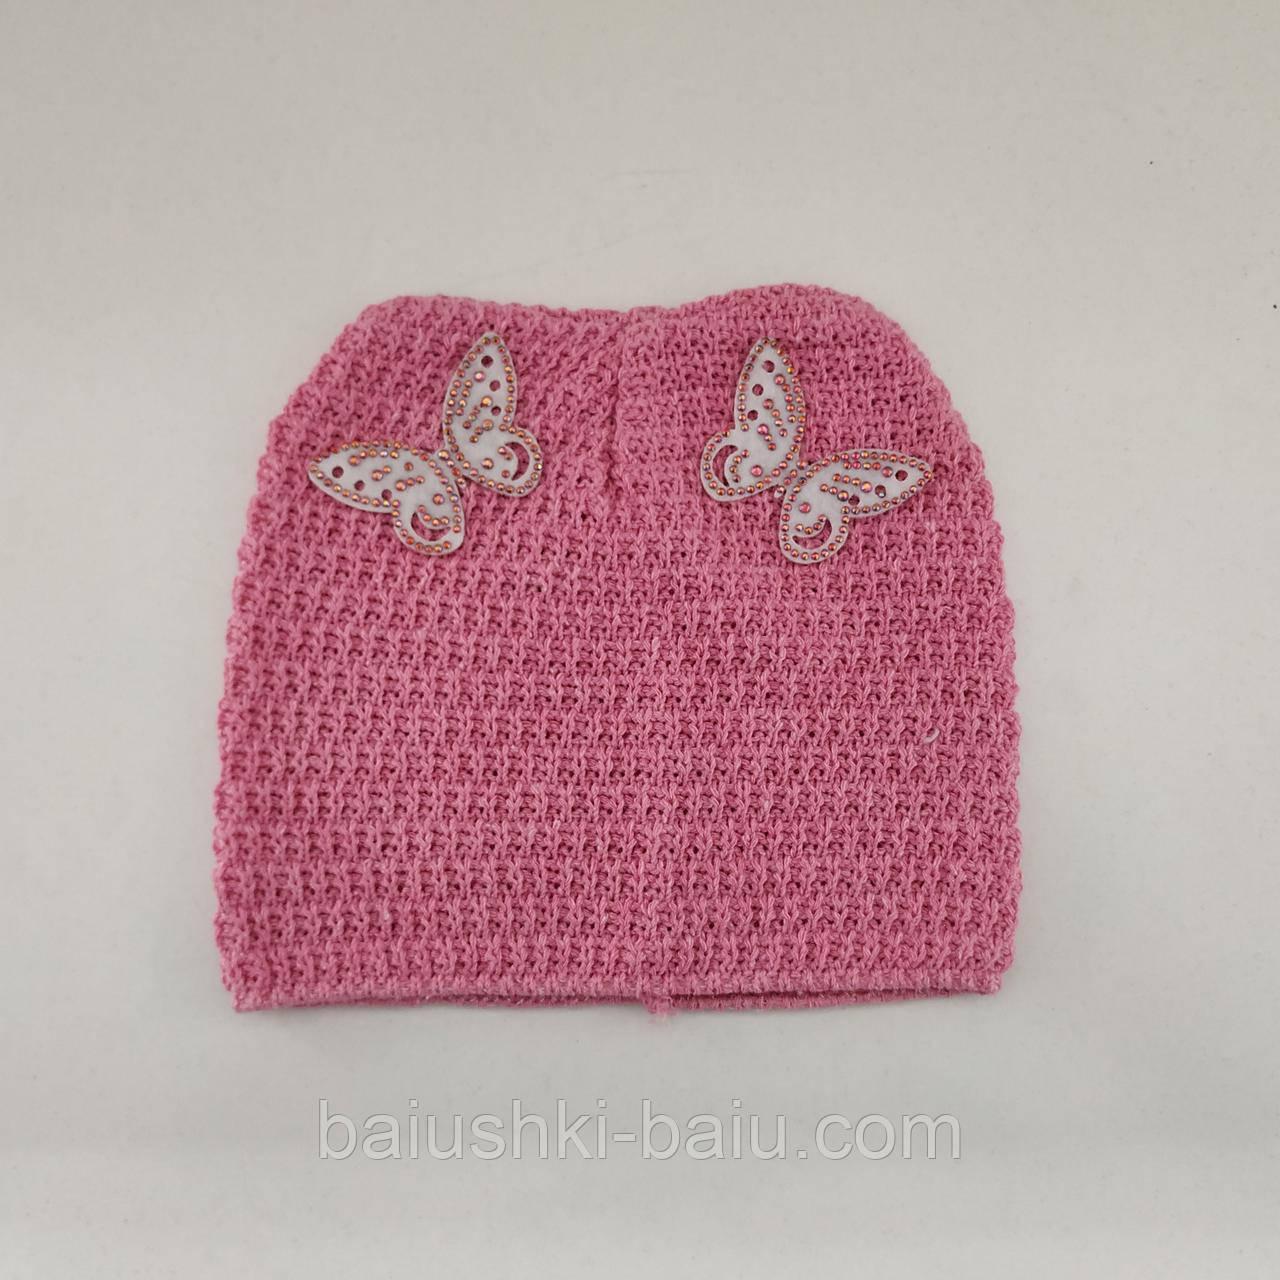 Вязаная летняя шапочка для девочки, р. 6-9 мес (276)